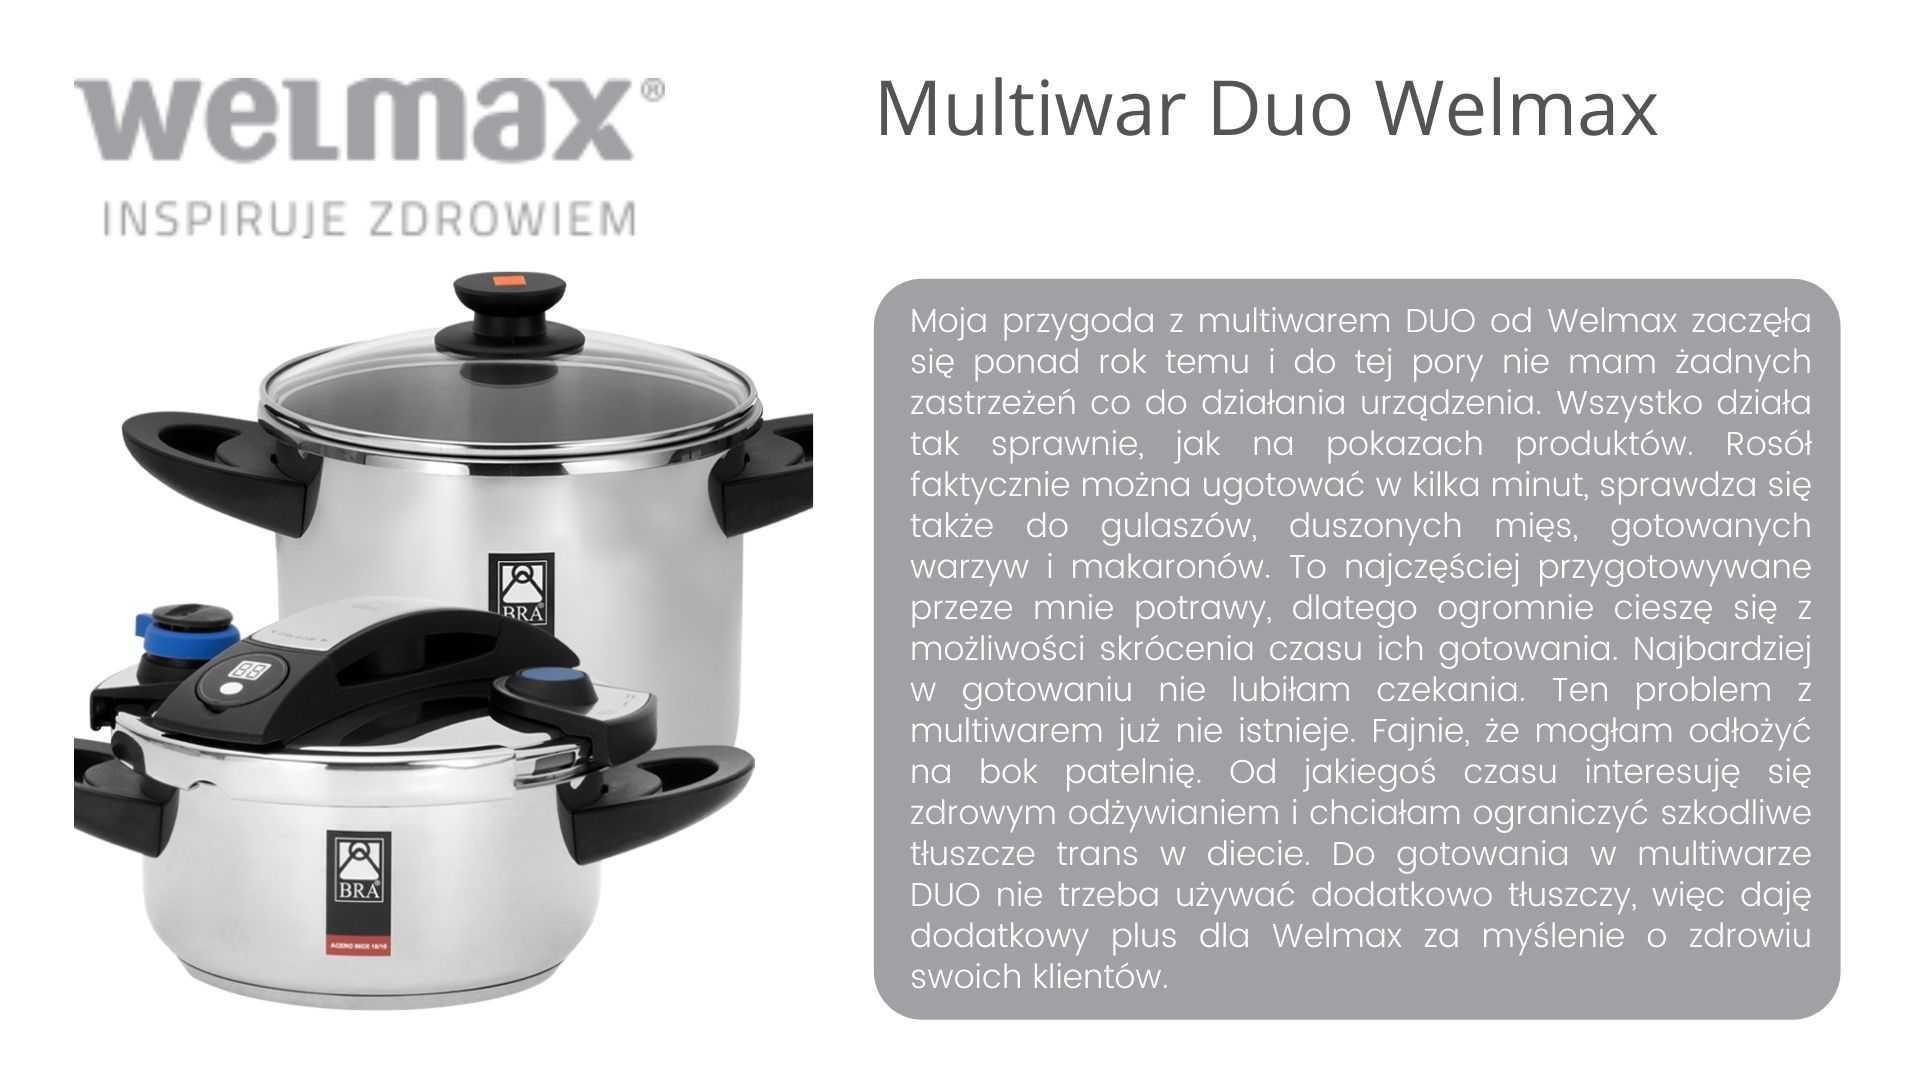 Multiwar DUO Welmax opinie